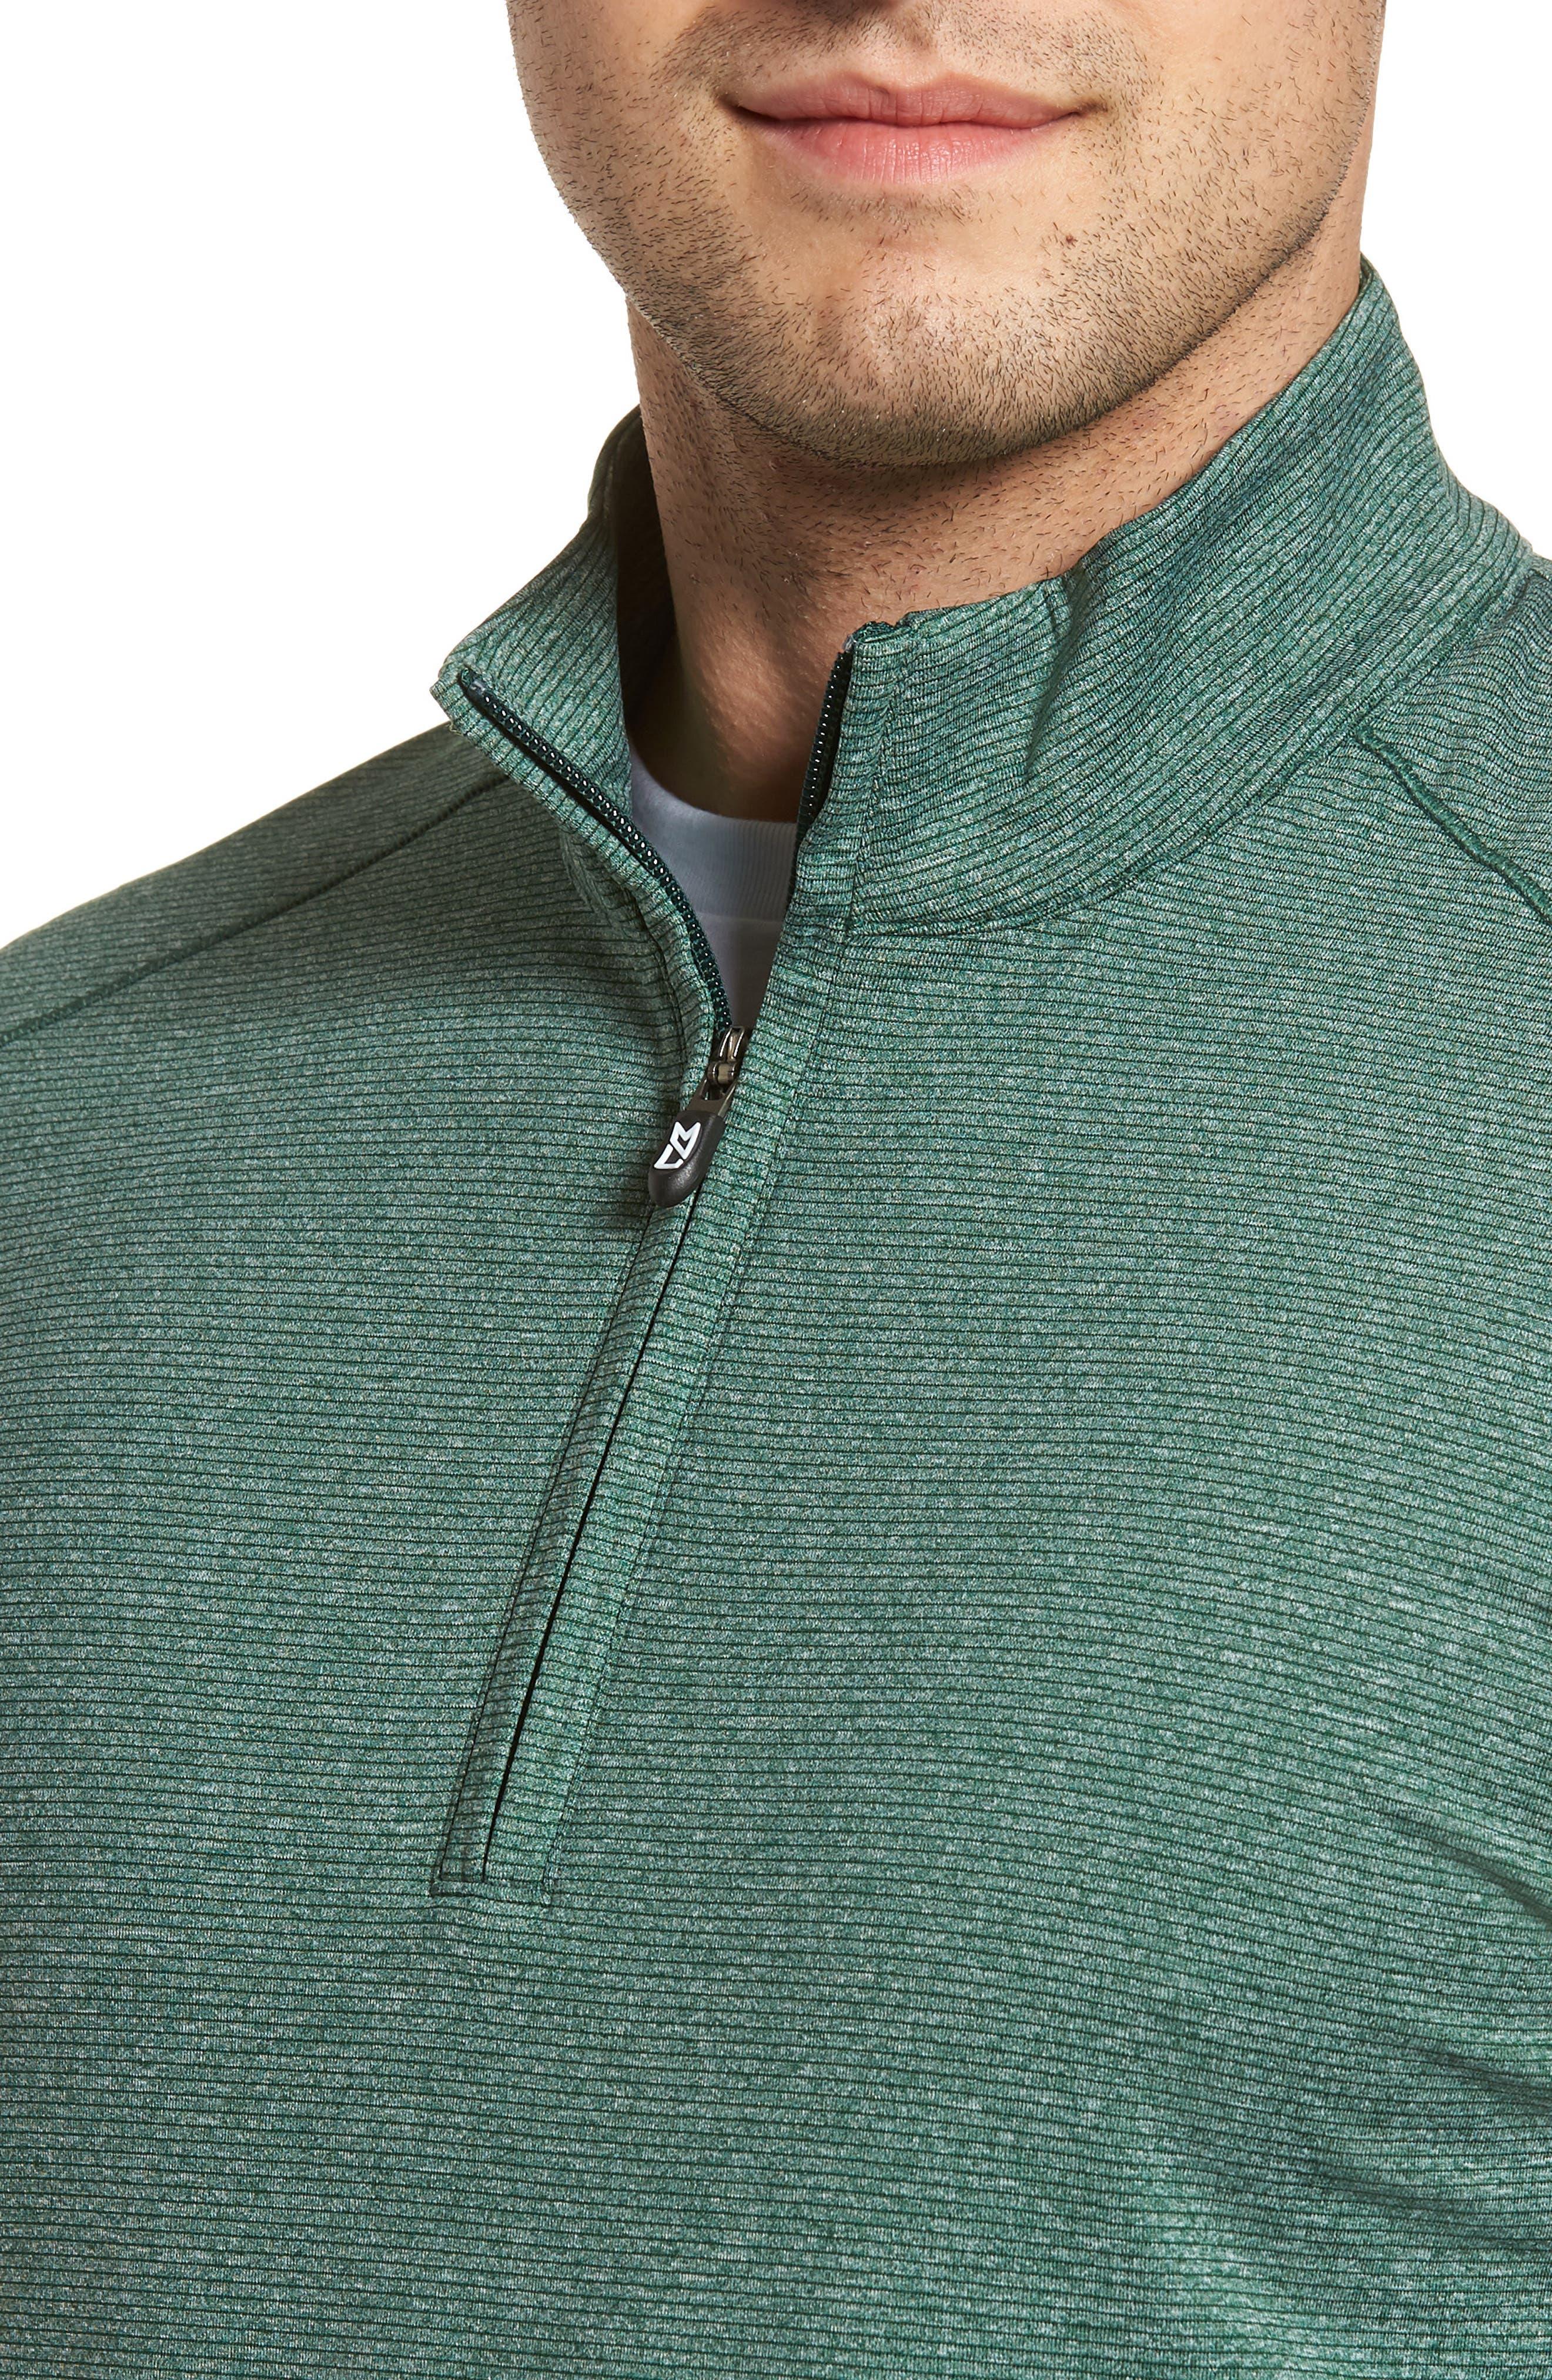 CUTTER & BUCK, Shoreline Classic Fit Half Zip Pullover, Alternate thumbnail 4, color, HUNTER HEATHER